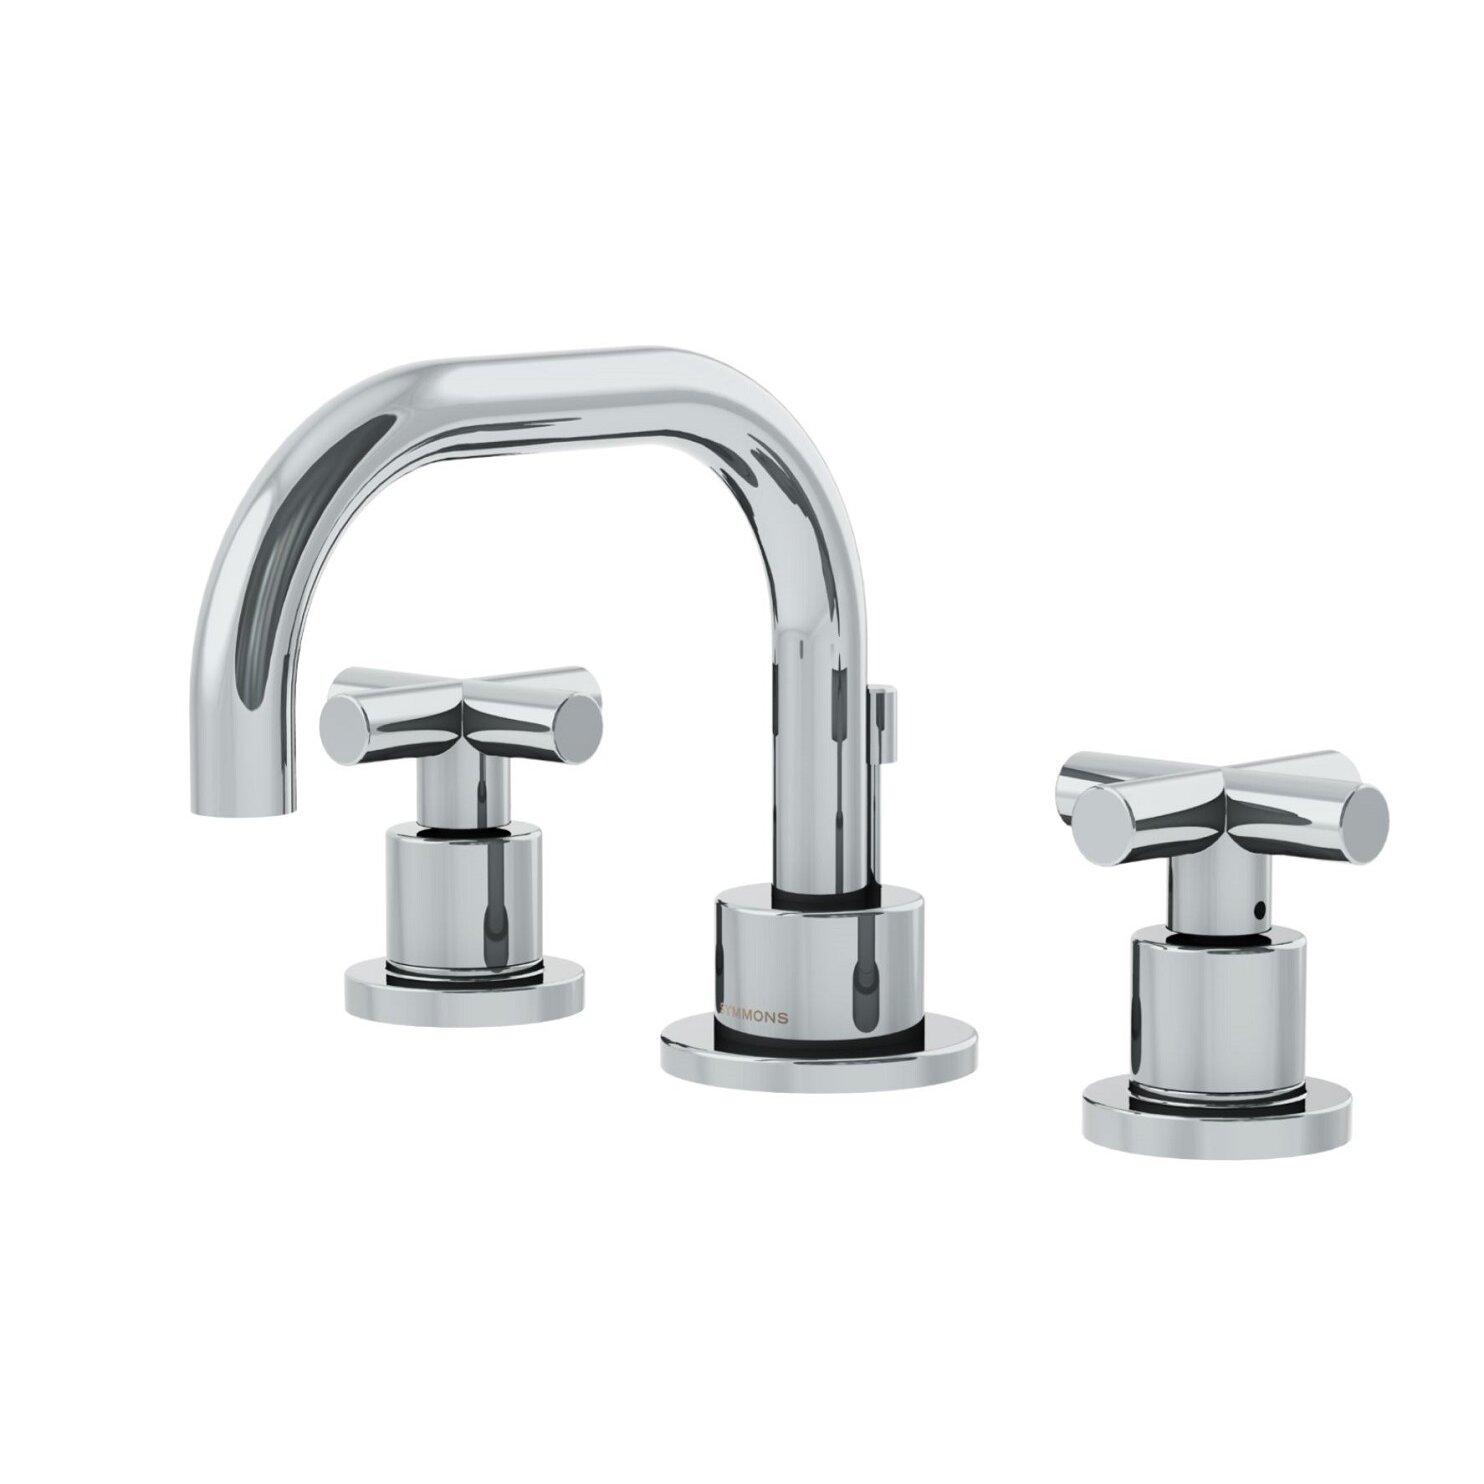 Cross Handle Bathroom Faucet Symmons Dia Low Spout Widespread Standard Bathroom Faucet Double